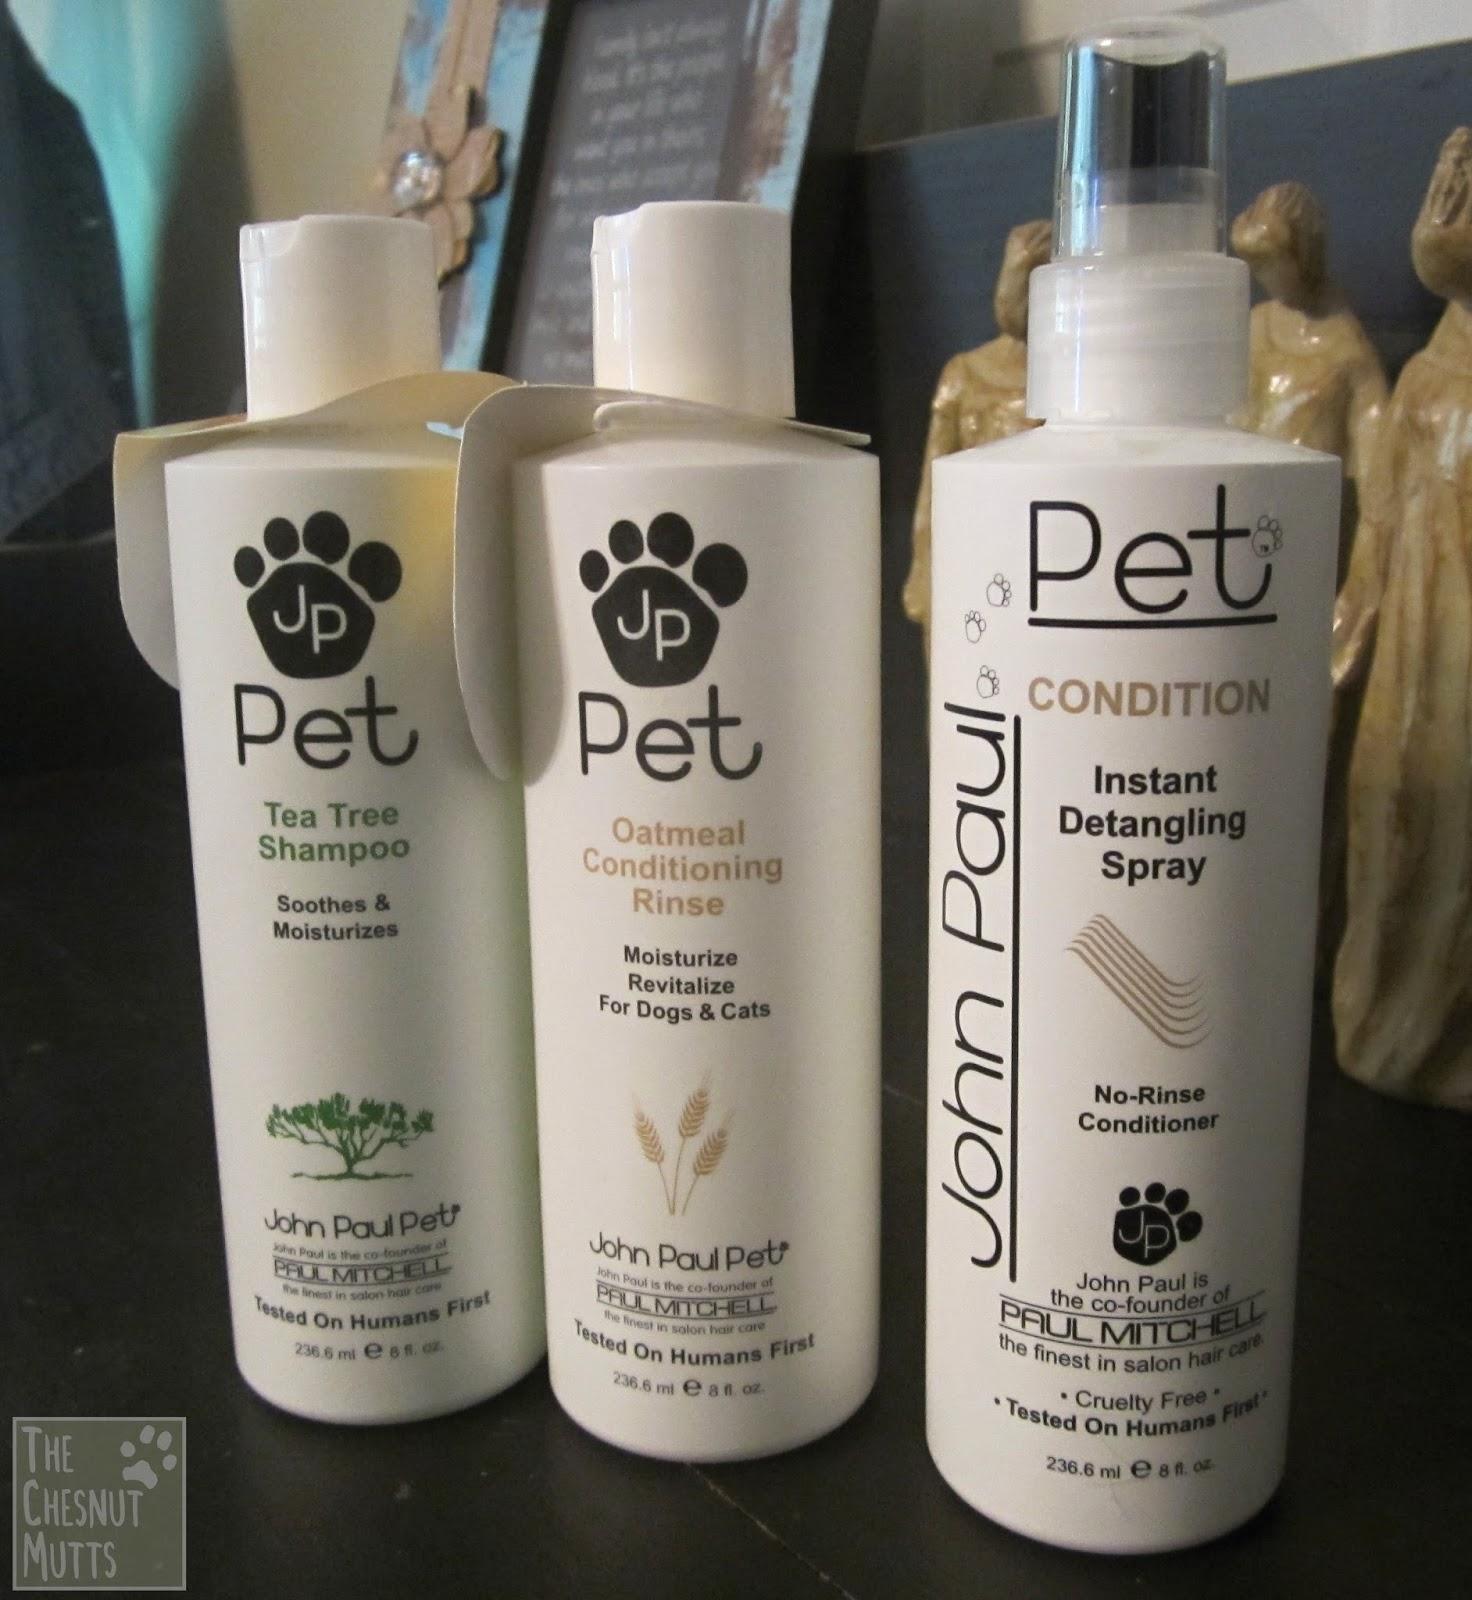 John Paul Pet Tea Tree Shampoo Oatmeal Conditioning Rinse And Instant Detangling Spray